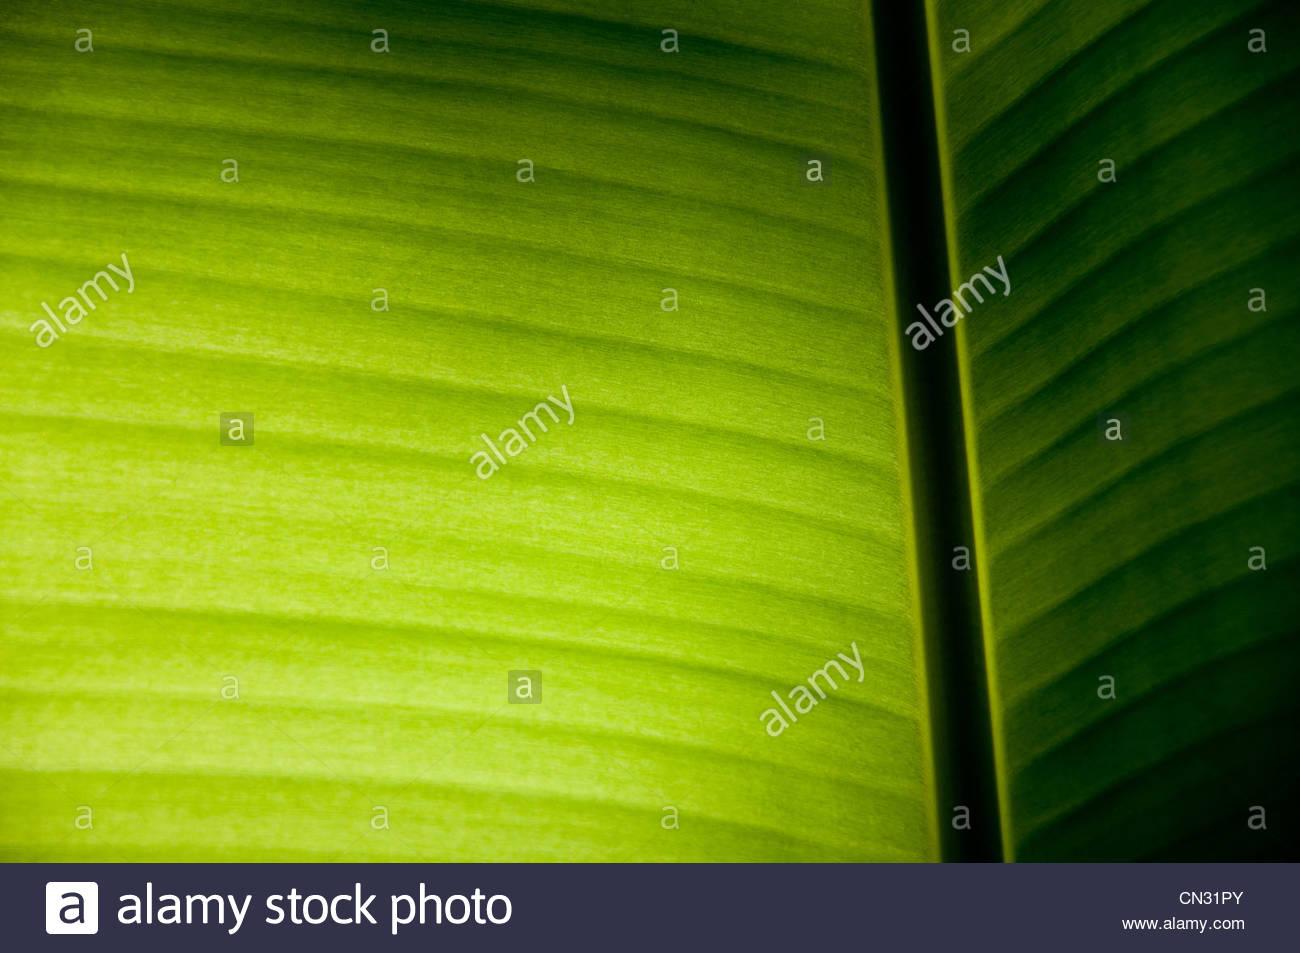 Banana Leaf on Light Effect - Stock Image